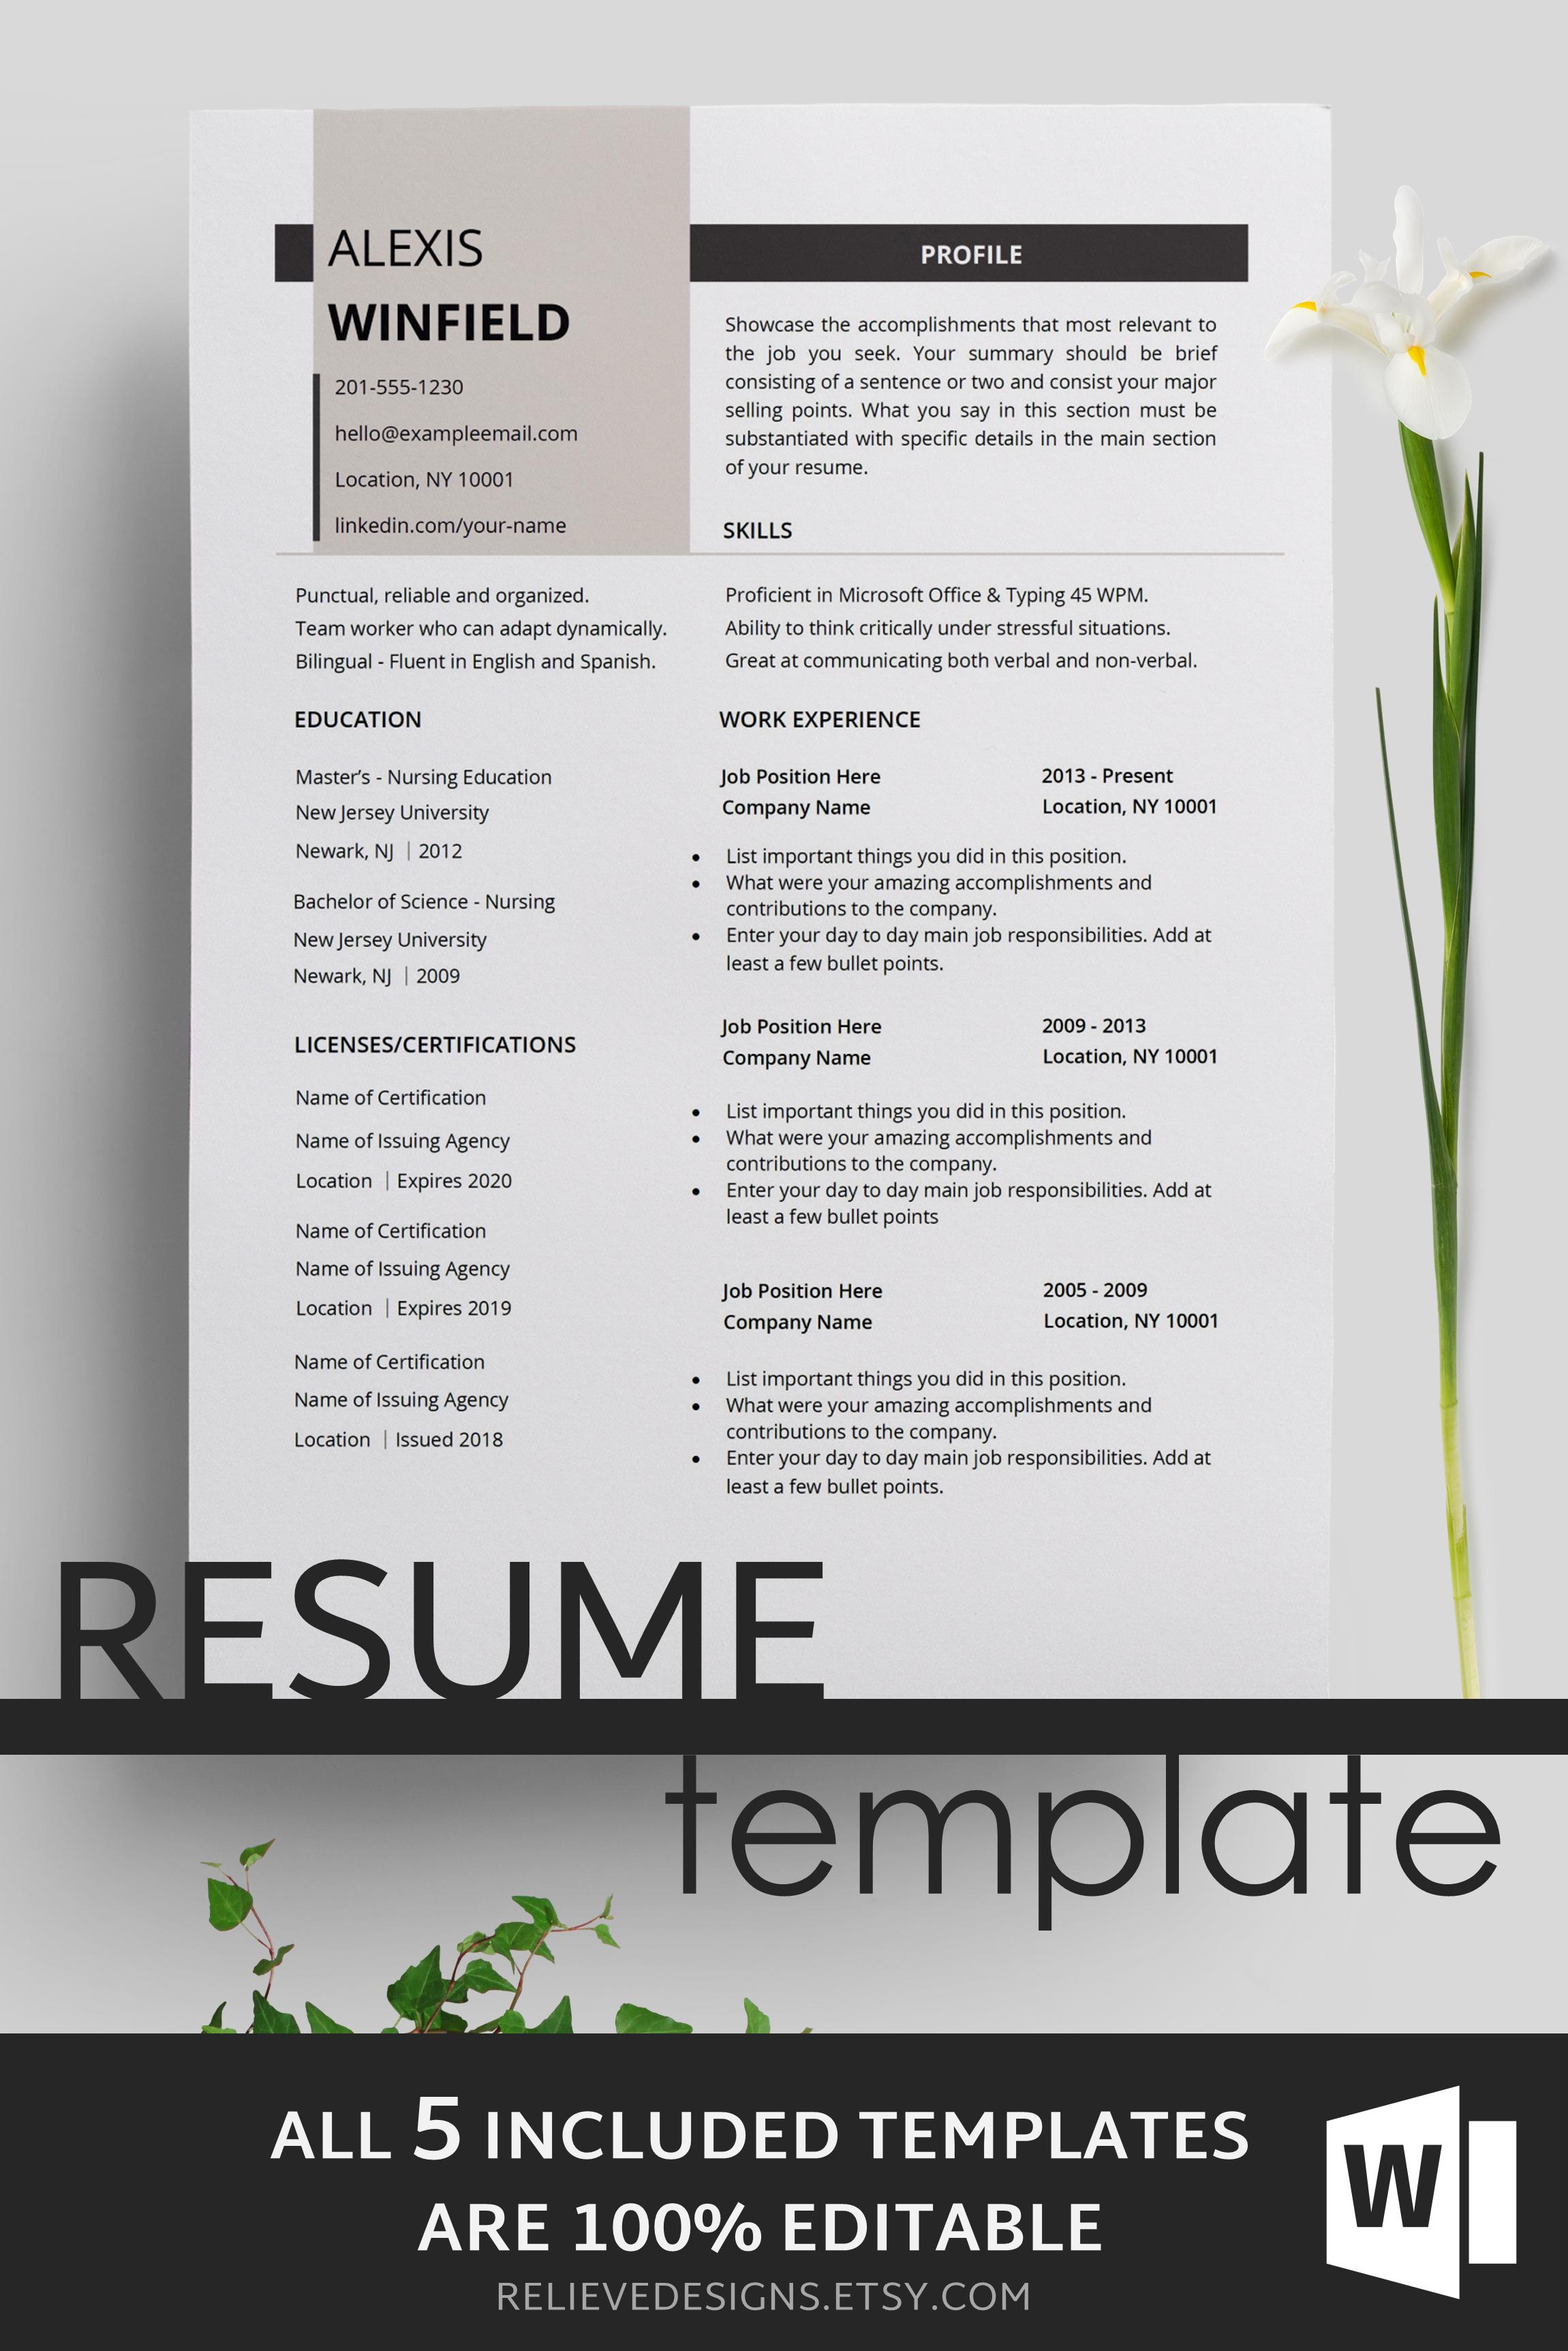 Resume Template, CV Template, CV Design. Creative